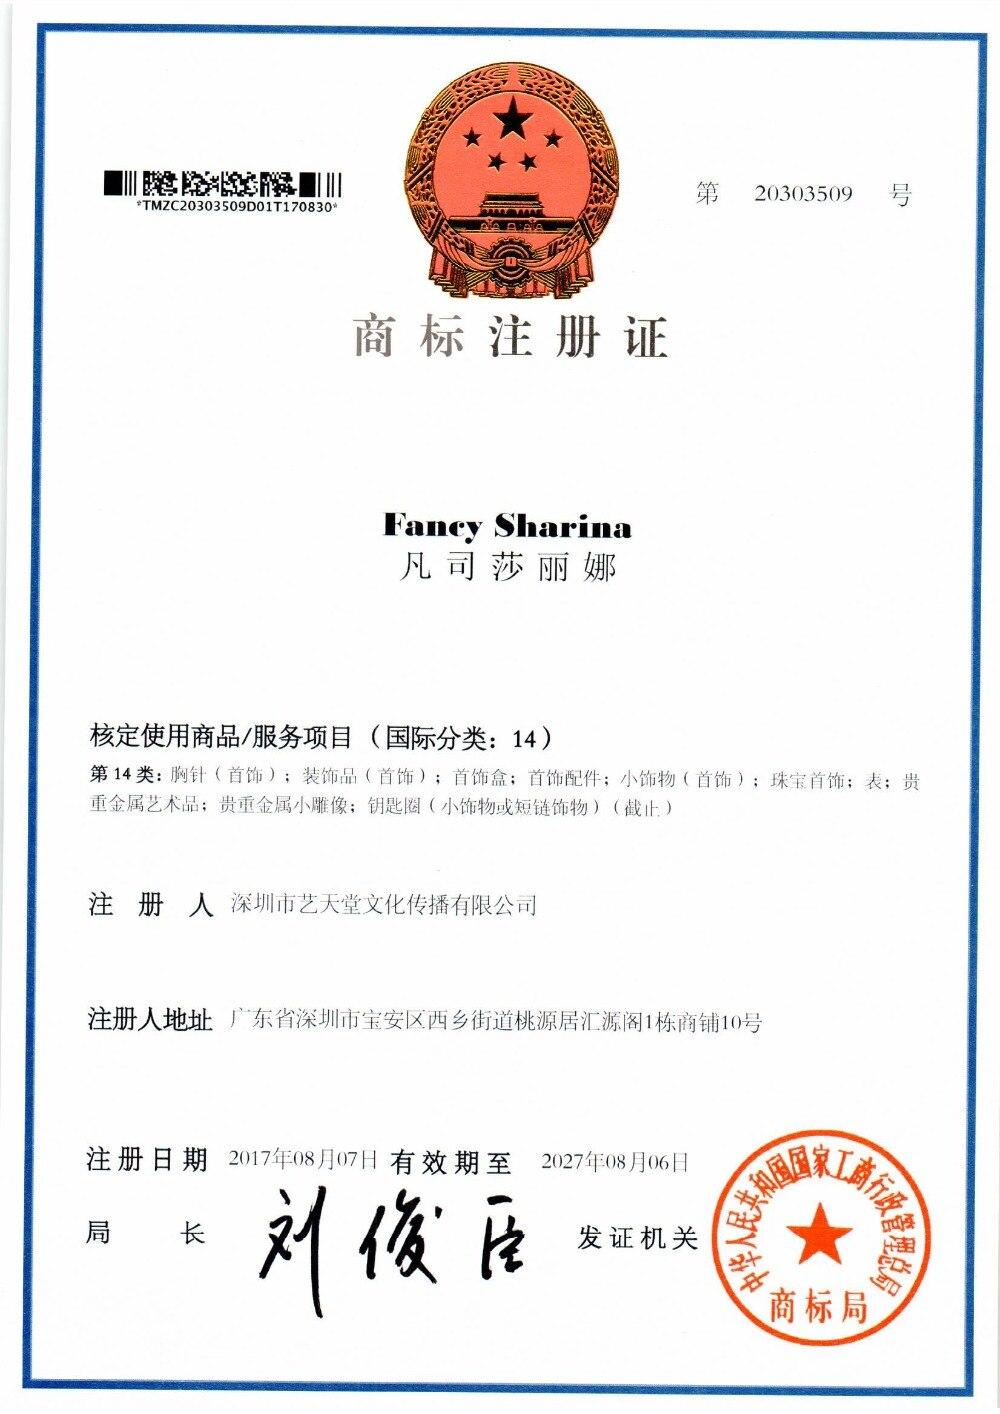 SCN0037+011160602100086+深圳市艺天堂文化传播有限公司